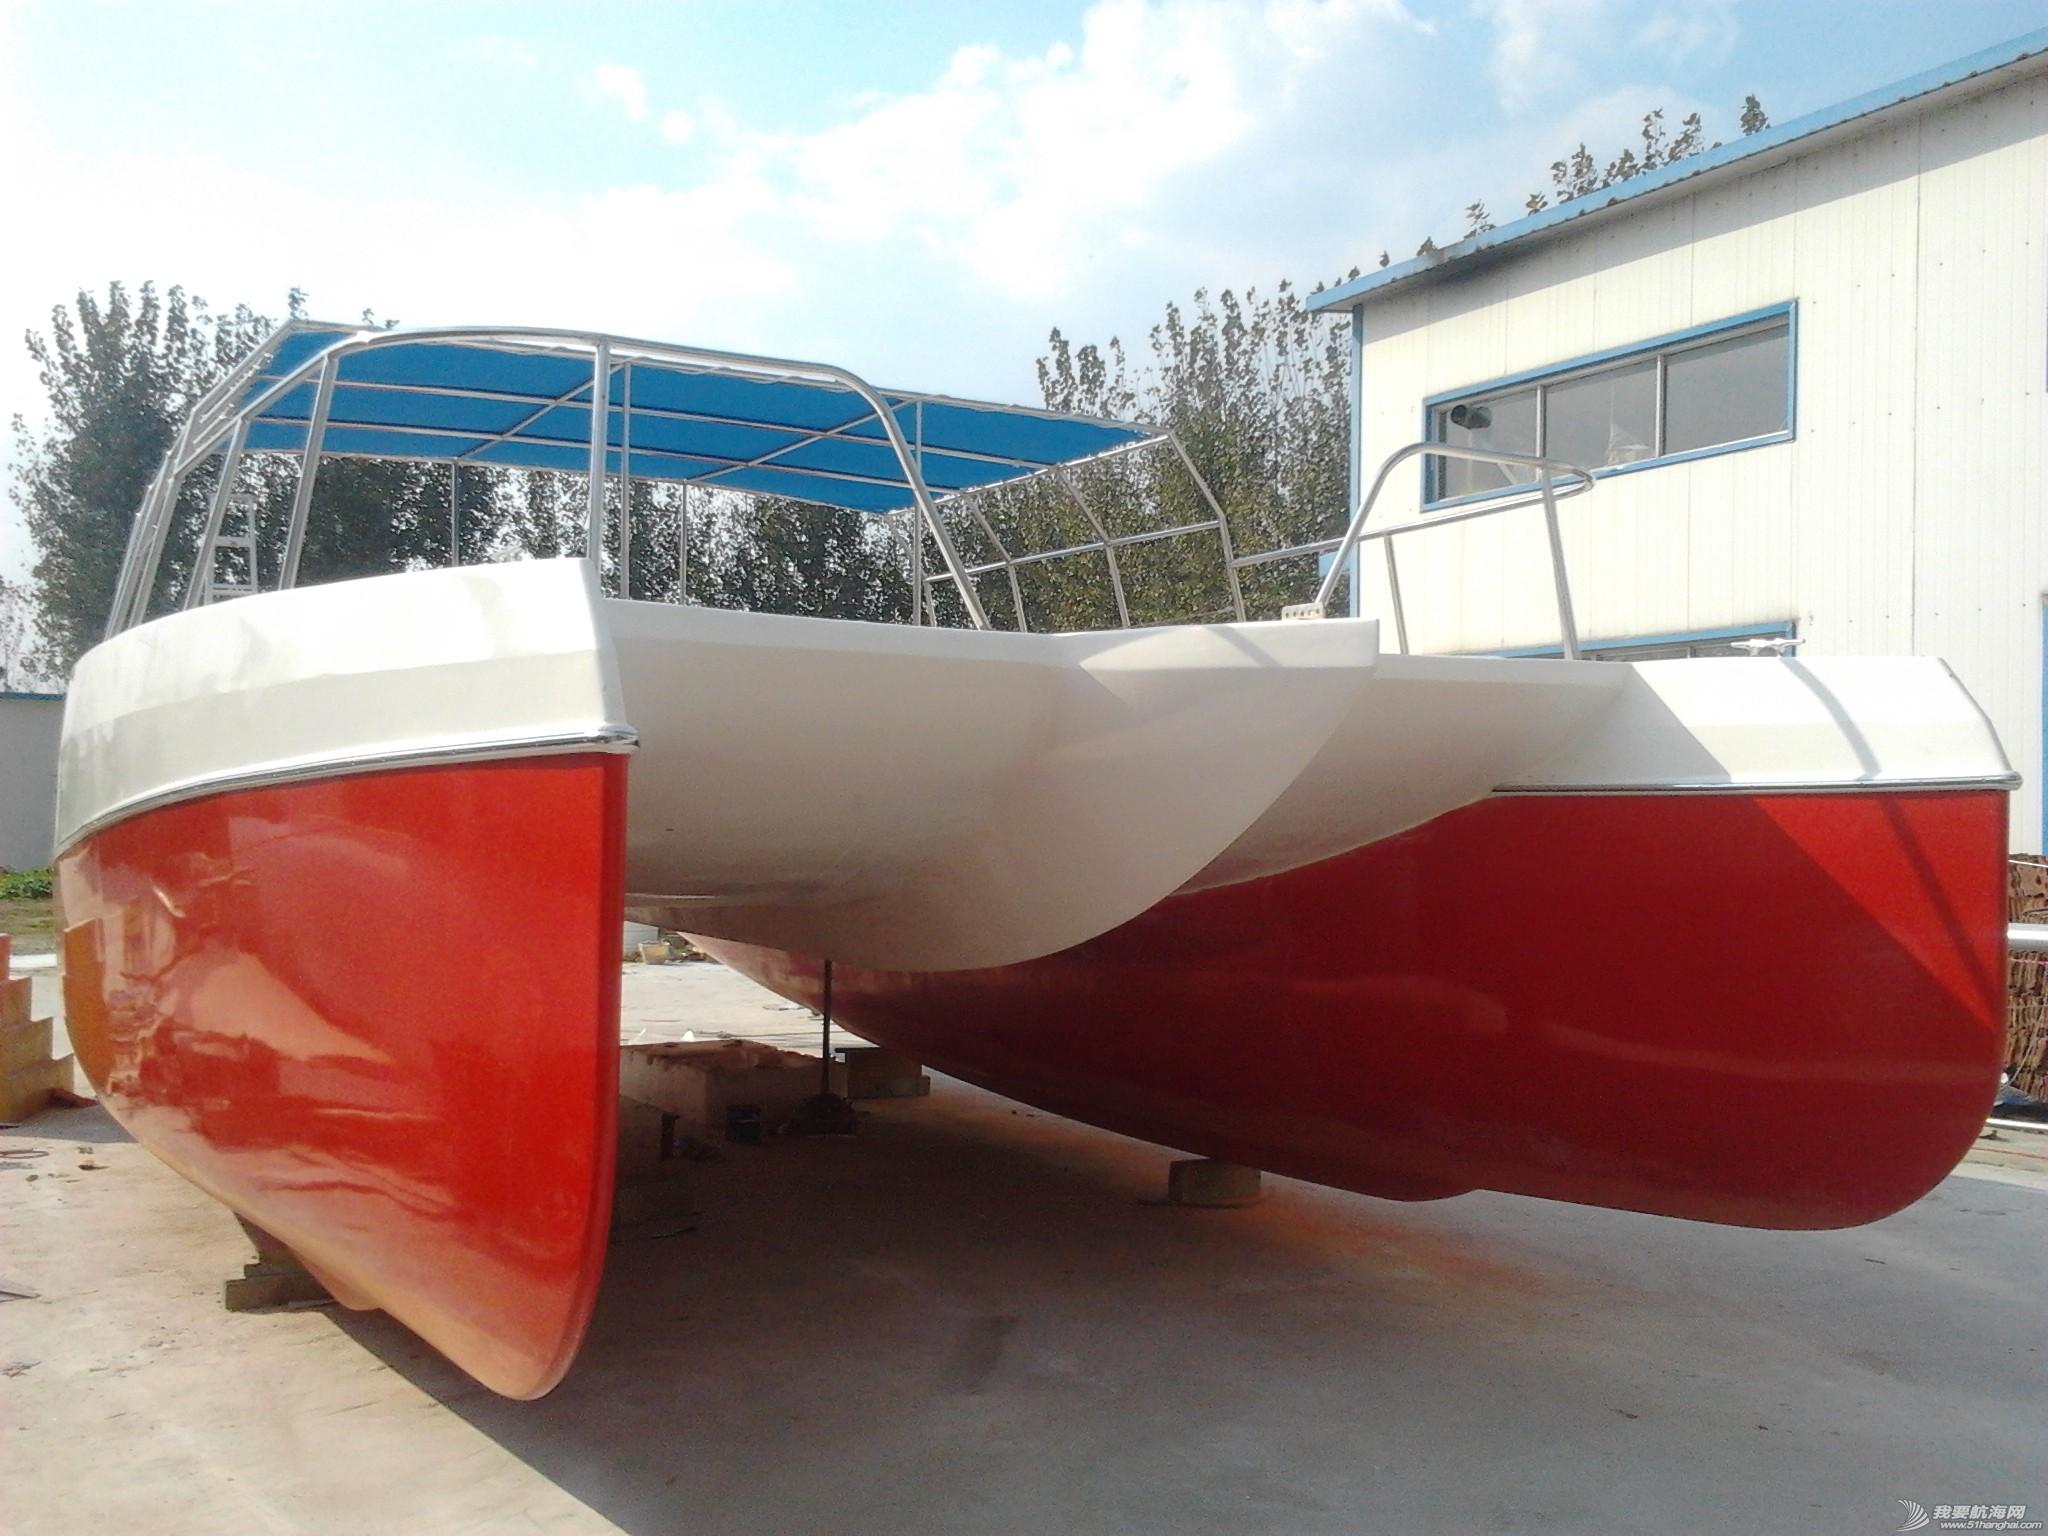 nbsp,帆船,旅游,载客,河流 双体观光旅游帆船  235907vzd8us4sz4suasqd